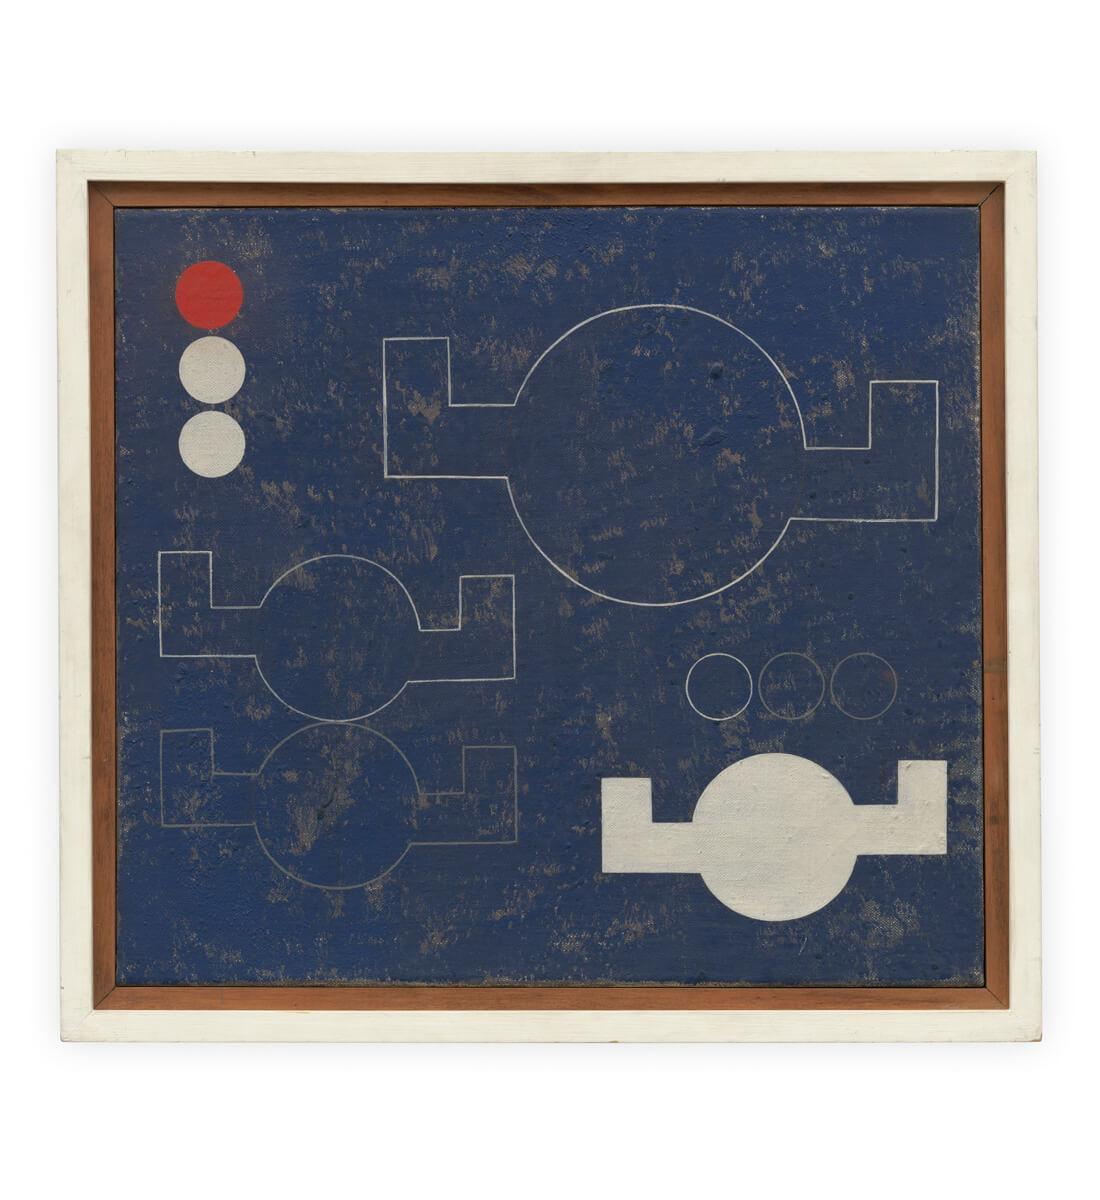 Composition à cercles-à-bras angulaires en lignes et plans <br>(Composition with circles with angular arms in lines and planes)